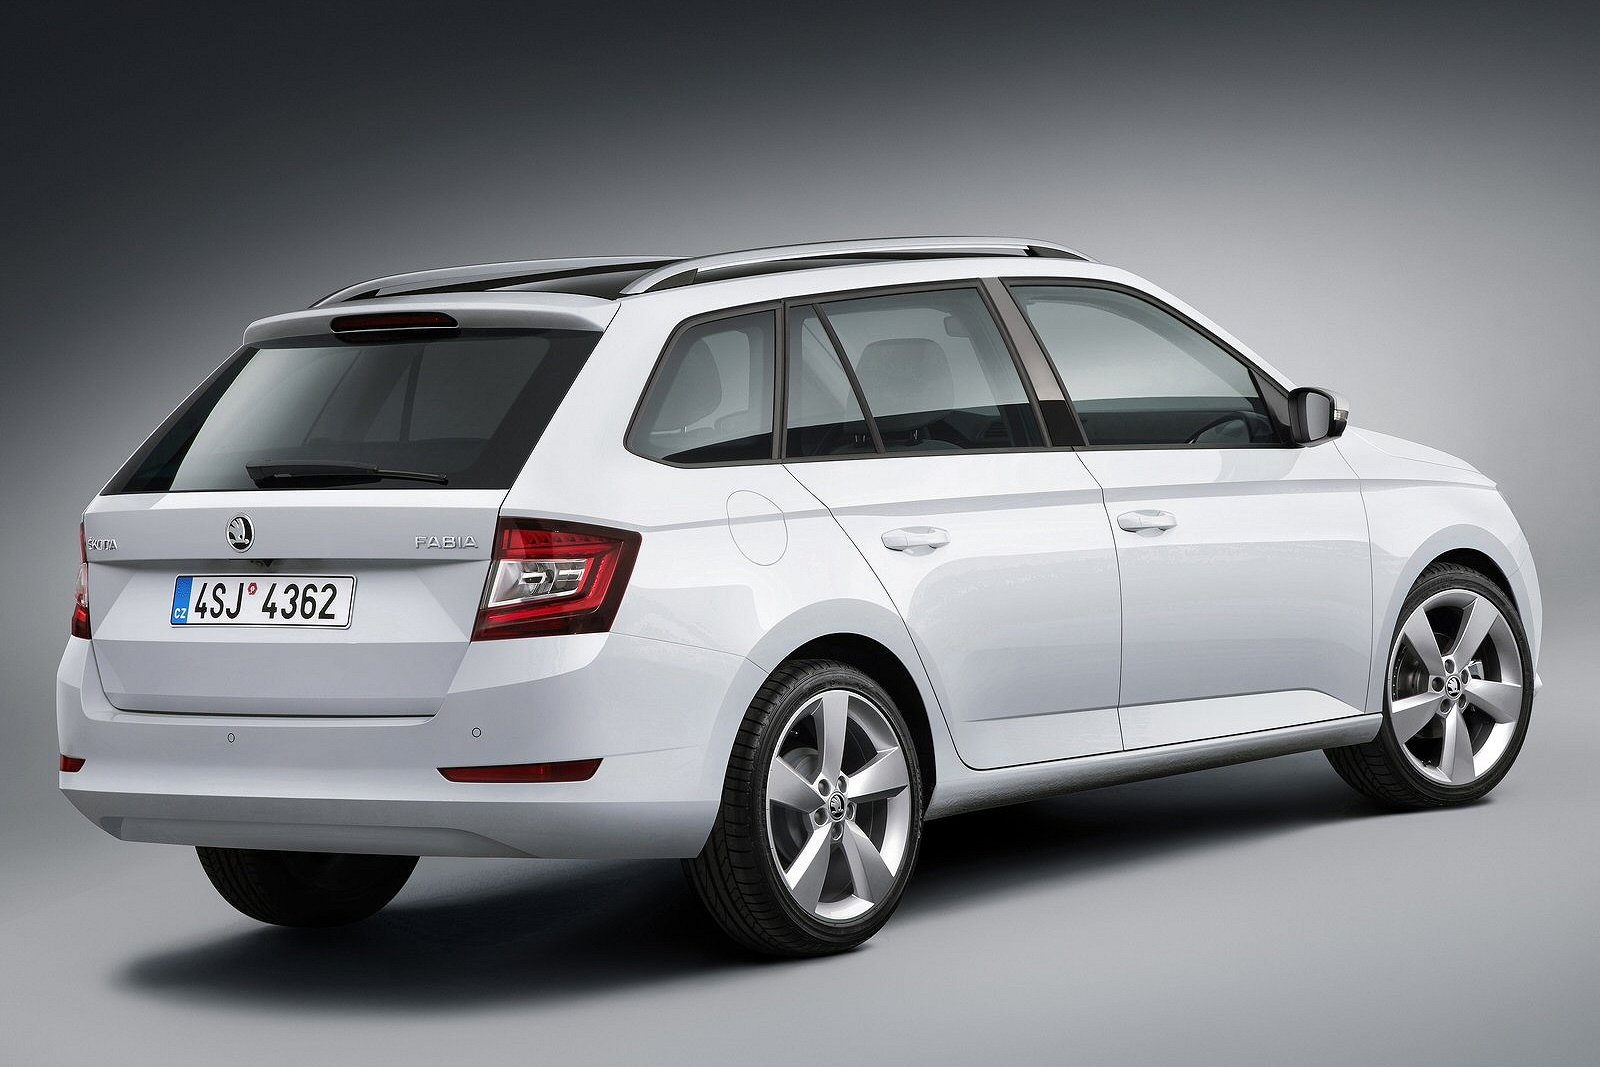 New Skoda Fabia 1 4 Tdi Monte Carlo 5dr Diesel Estate For Sale